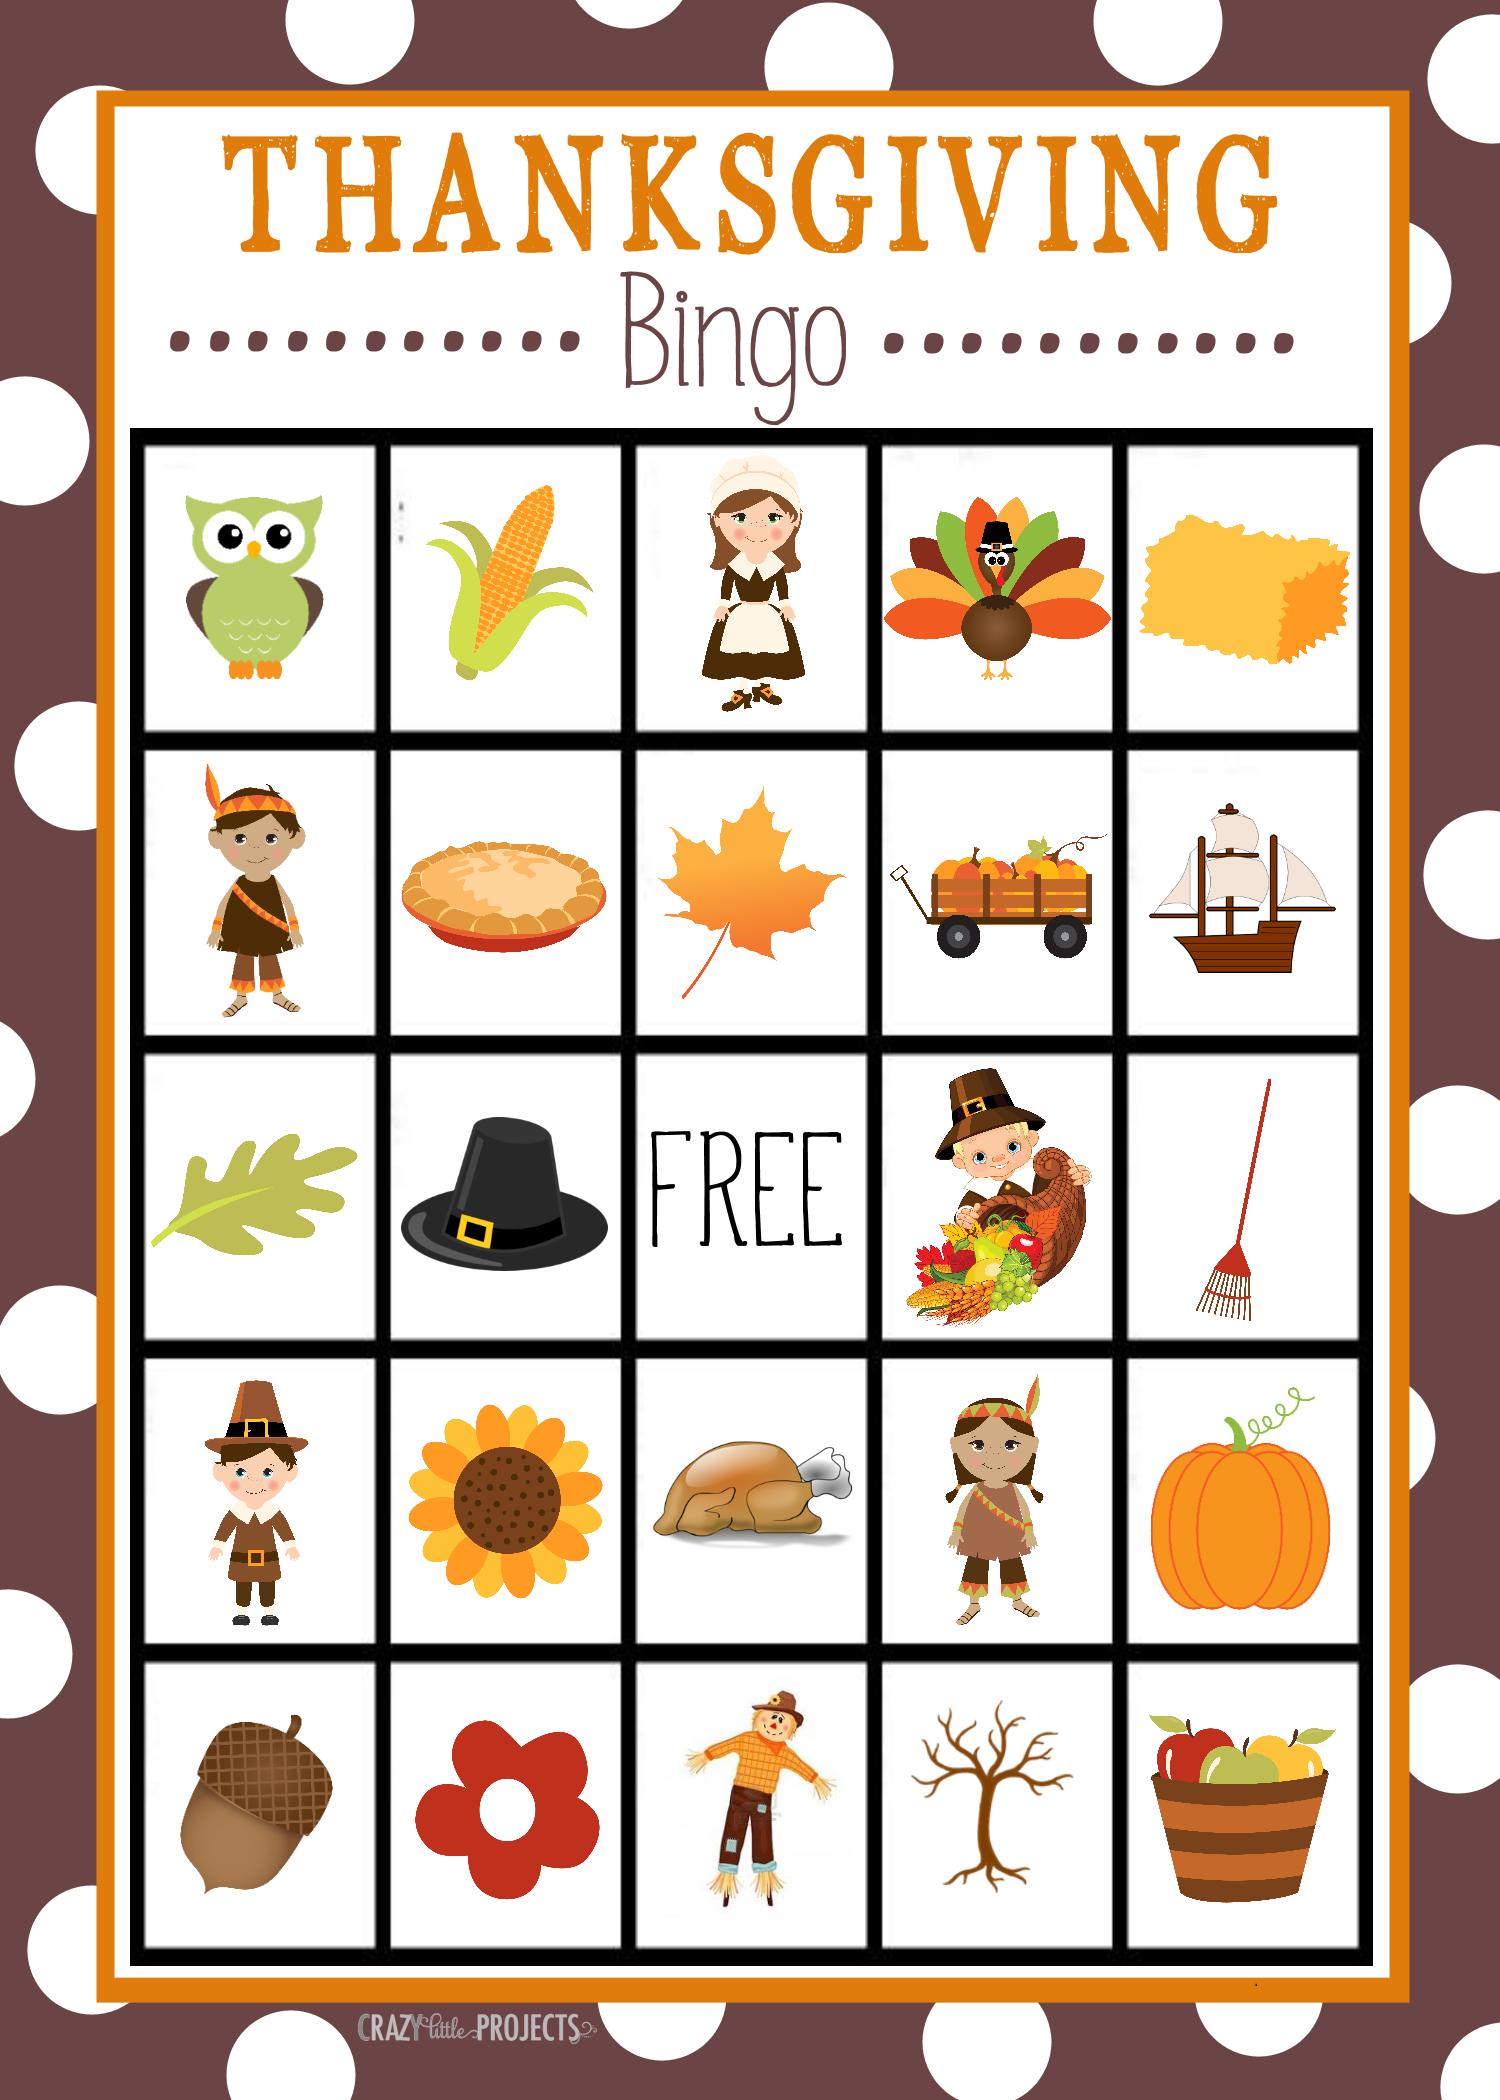 Free Printable Thanksgiving Bingo Game   Craft Time   Thanksgiving - Free Printable Thanksgiving Games For Adults